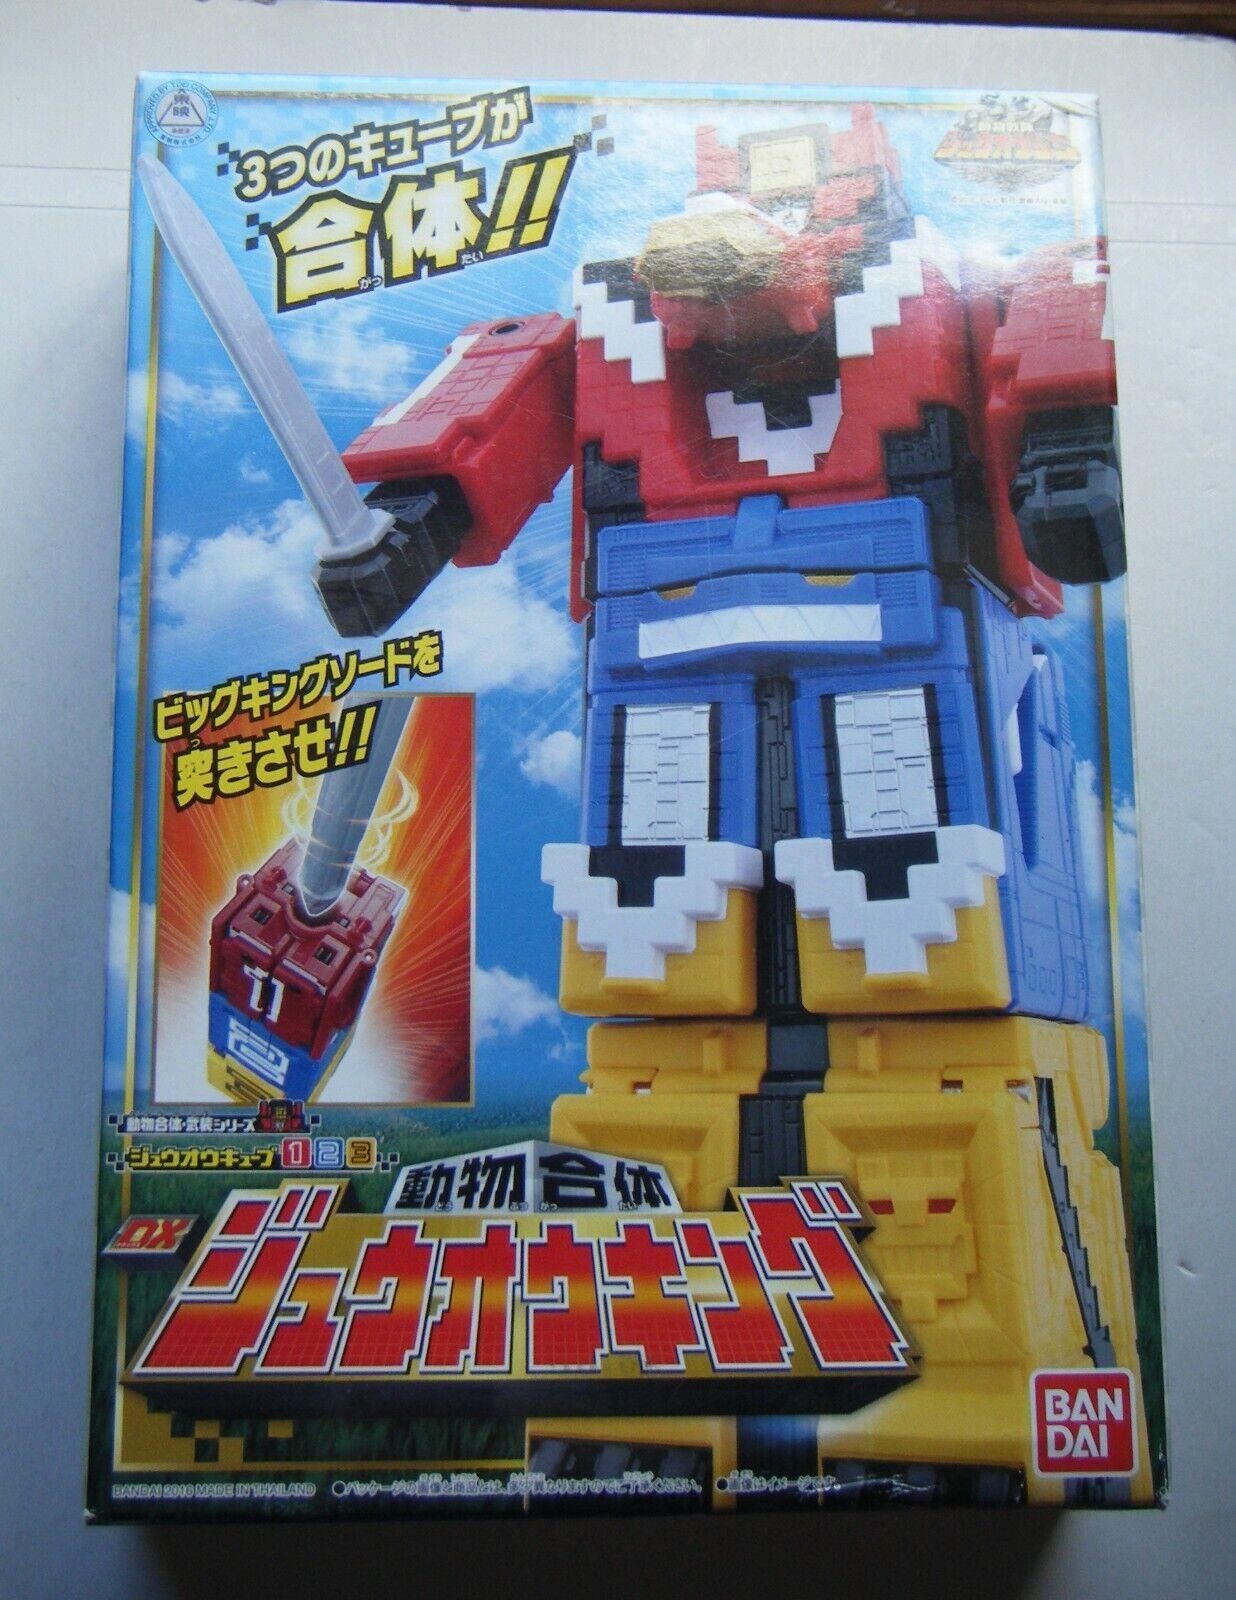 Doubutsu Sentai Sentai Sentai Zyuohger - DX Zyuoh King 123